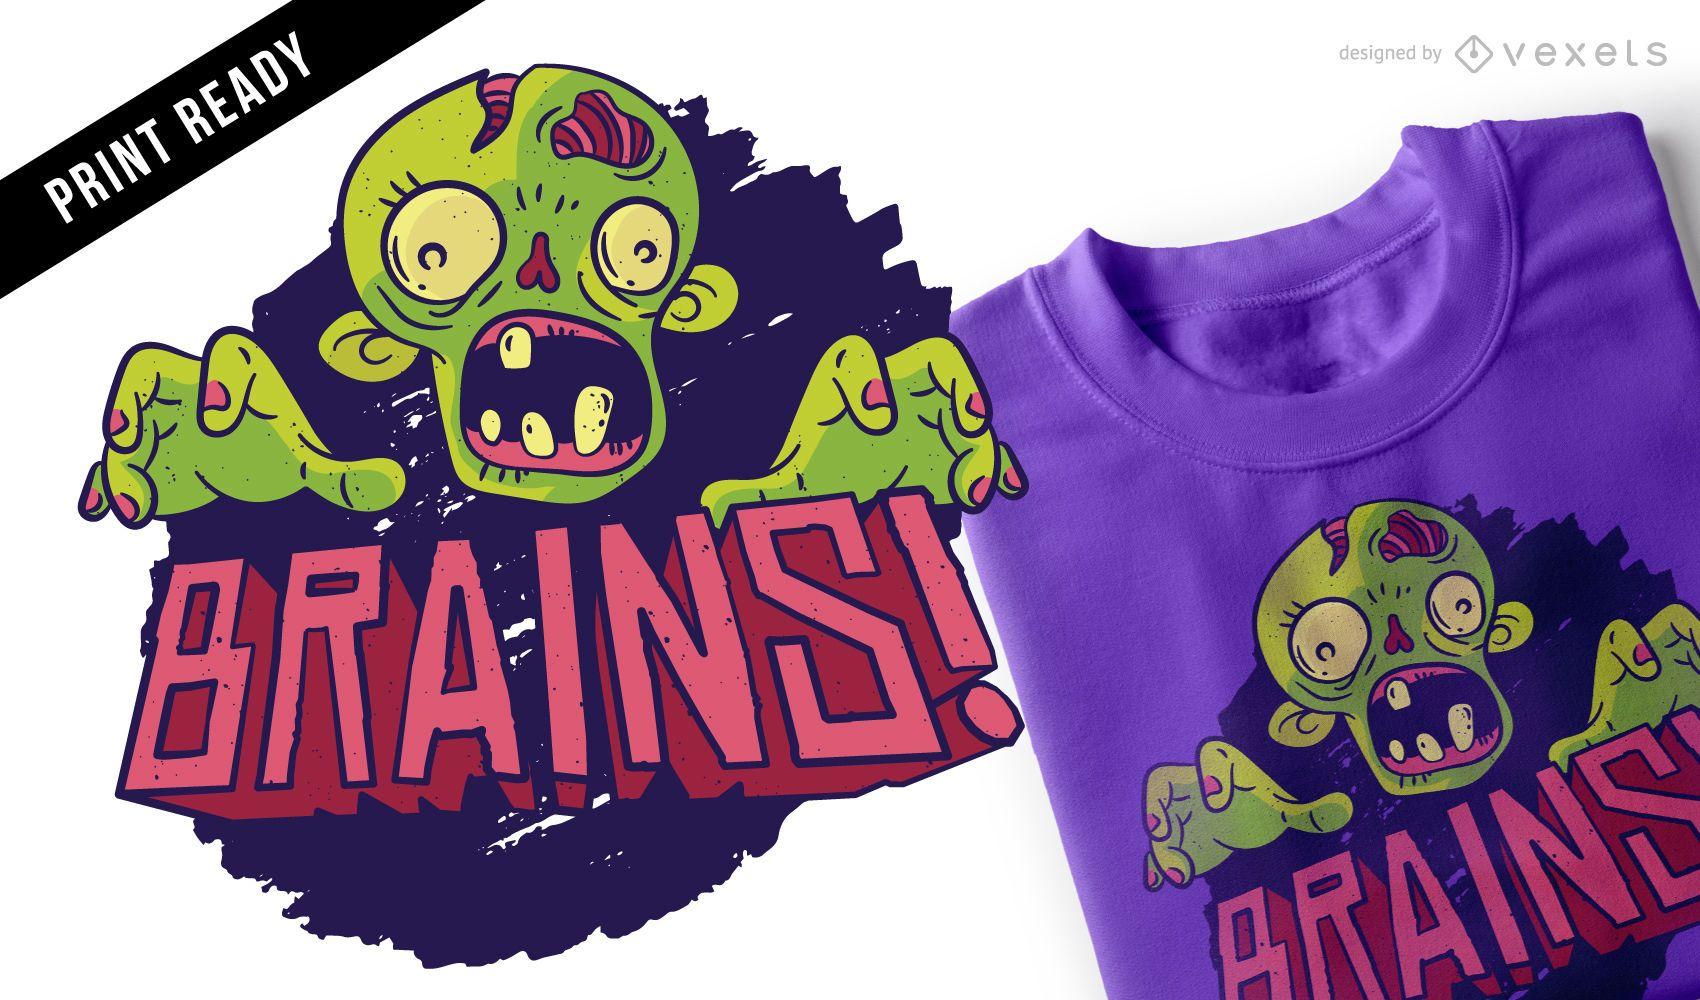 Diseño de camiseta Brains zombie